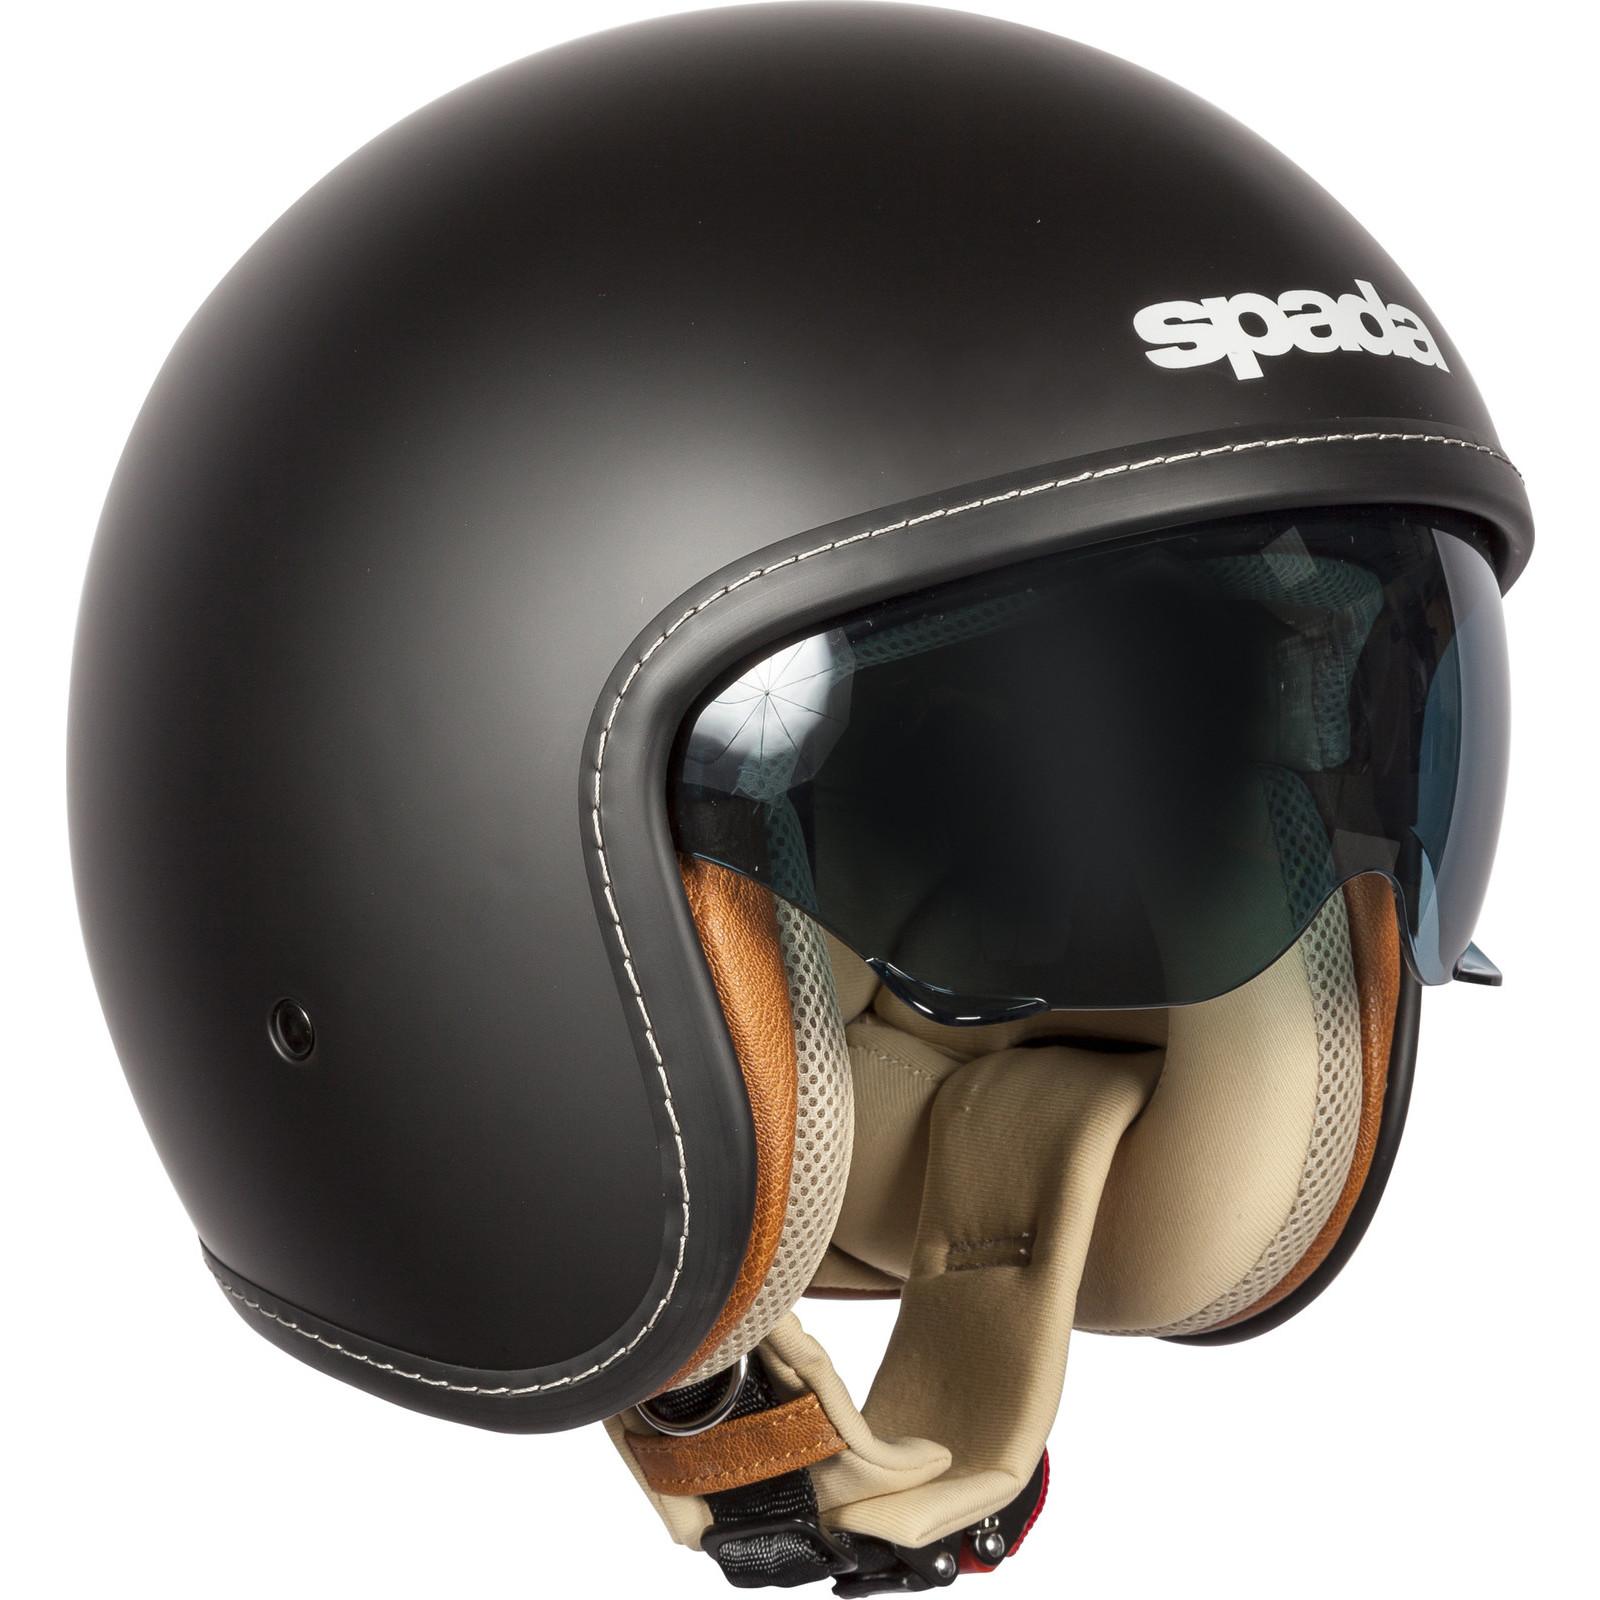 Spada-Raze-Solid-Black-Open-Face-Motorcycle-Helmet-Motorbike-Sun-Visor-Scooter